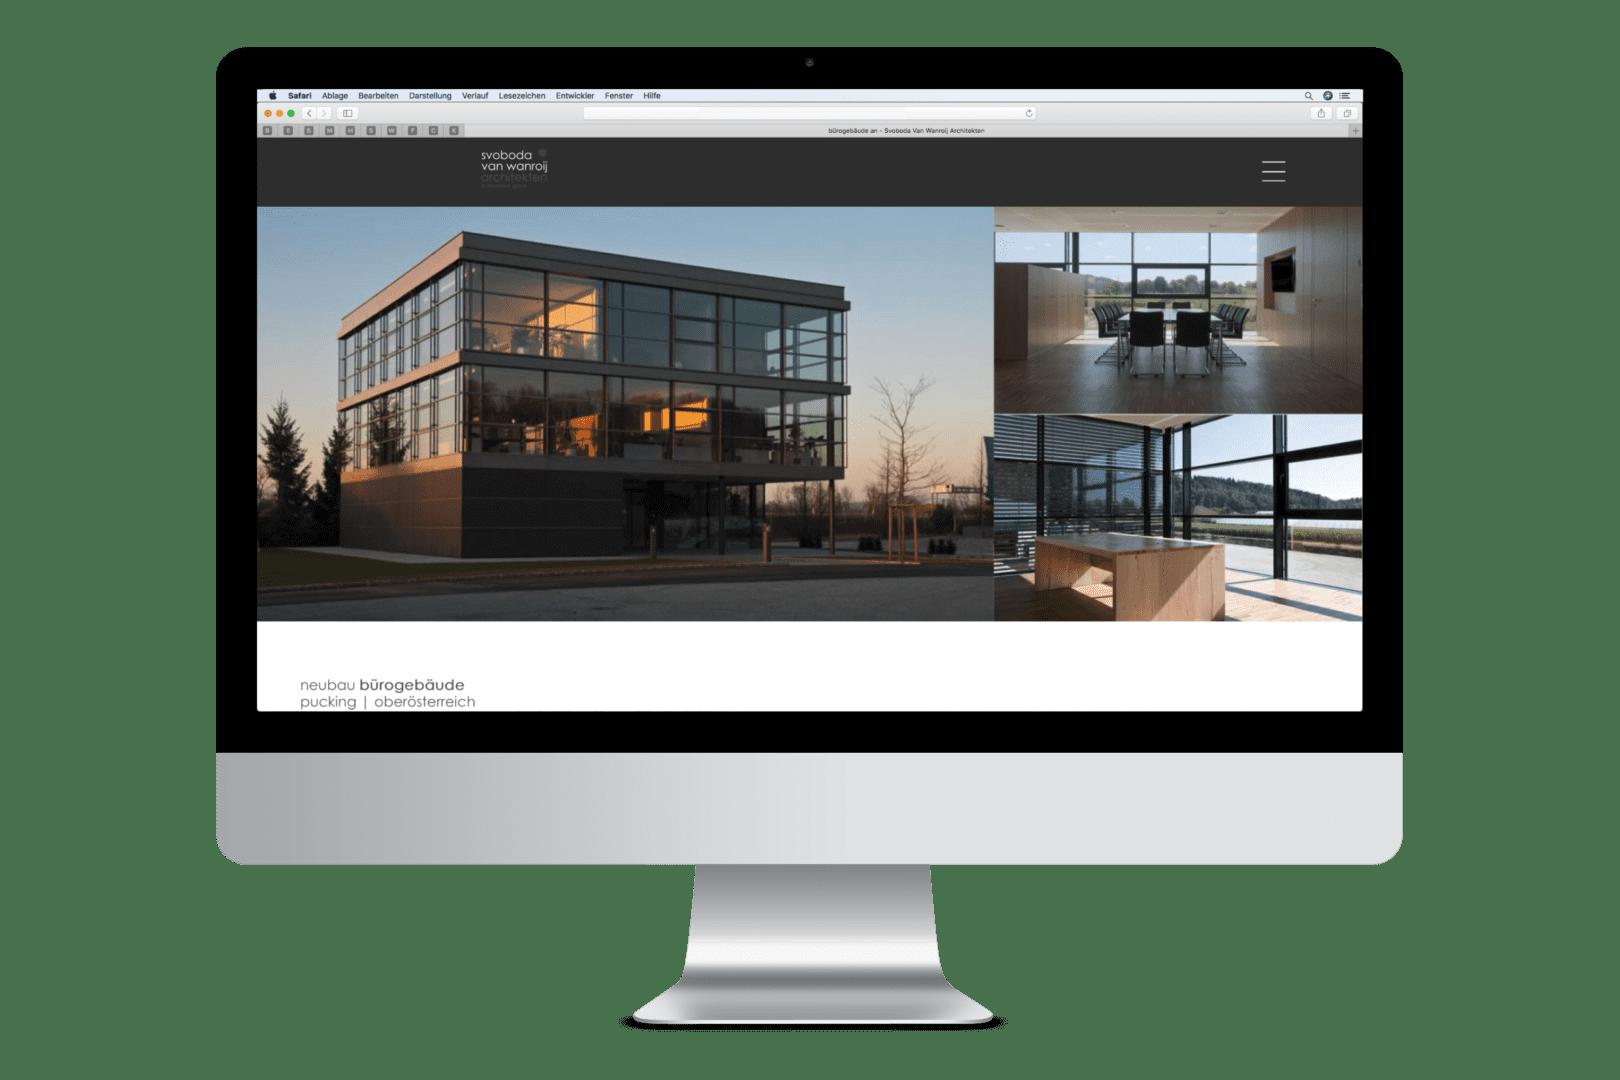 svw-projektseite-imac